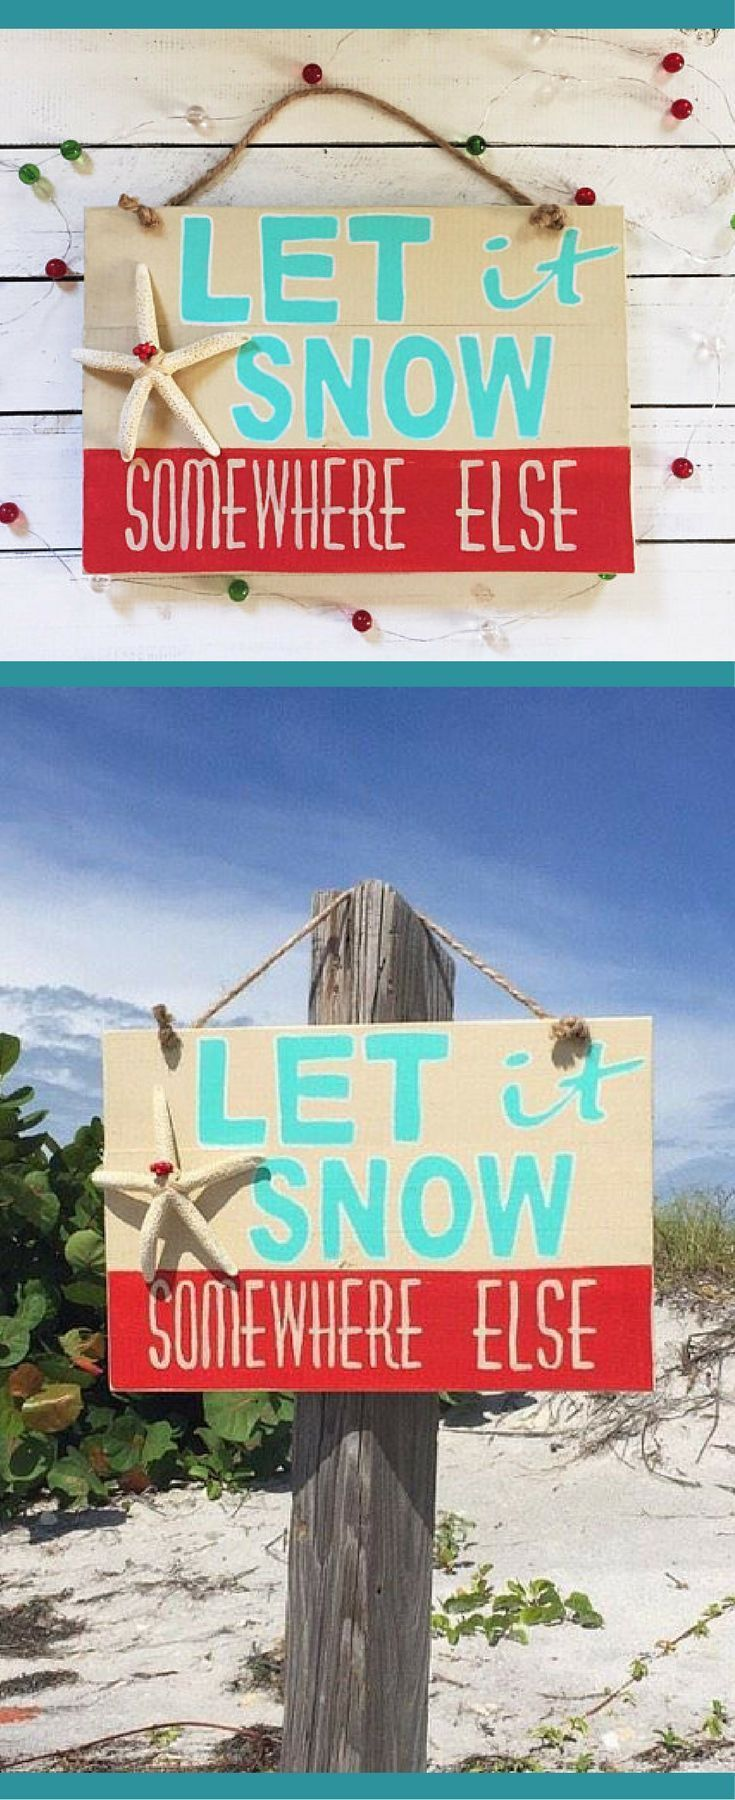 Let it Snow Somewhere Else, Christmas Mantle Decor, Wood Christmas Sign, Coastal Christmas Decor, Beach Christmas decor, Christmas beach vacation, Rustic Christmas Decor, Gift Under 50 #affiliate